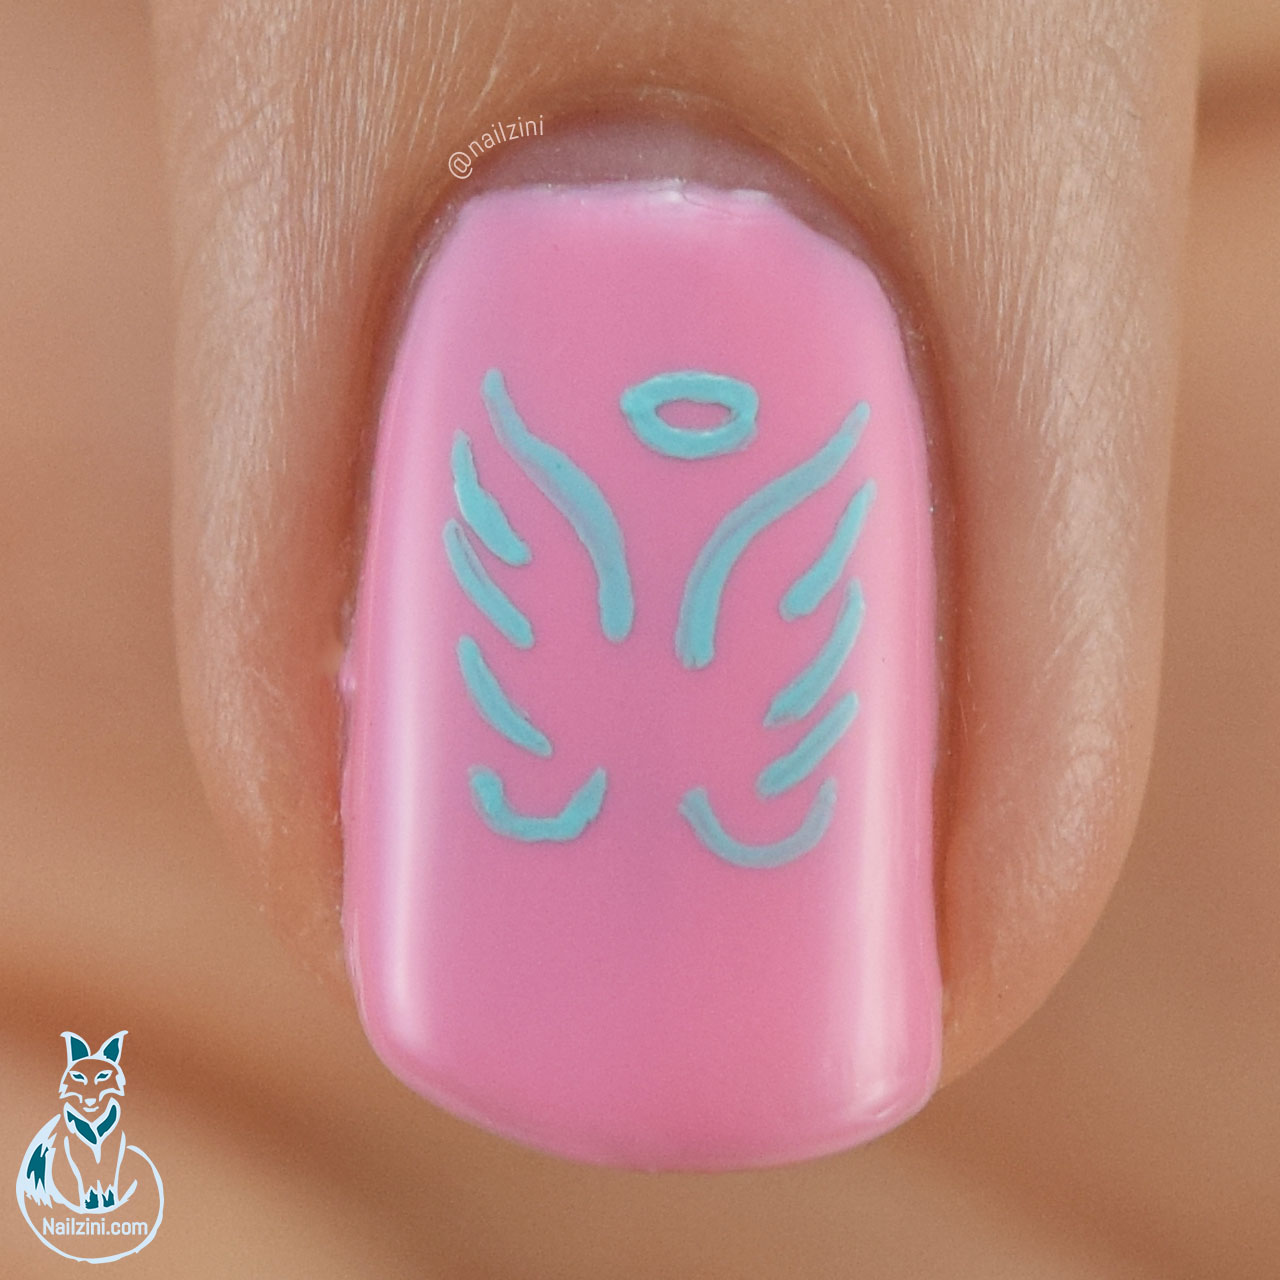 Angel Wings Madam Glam Nailzini